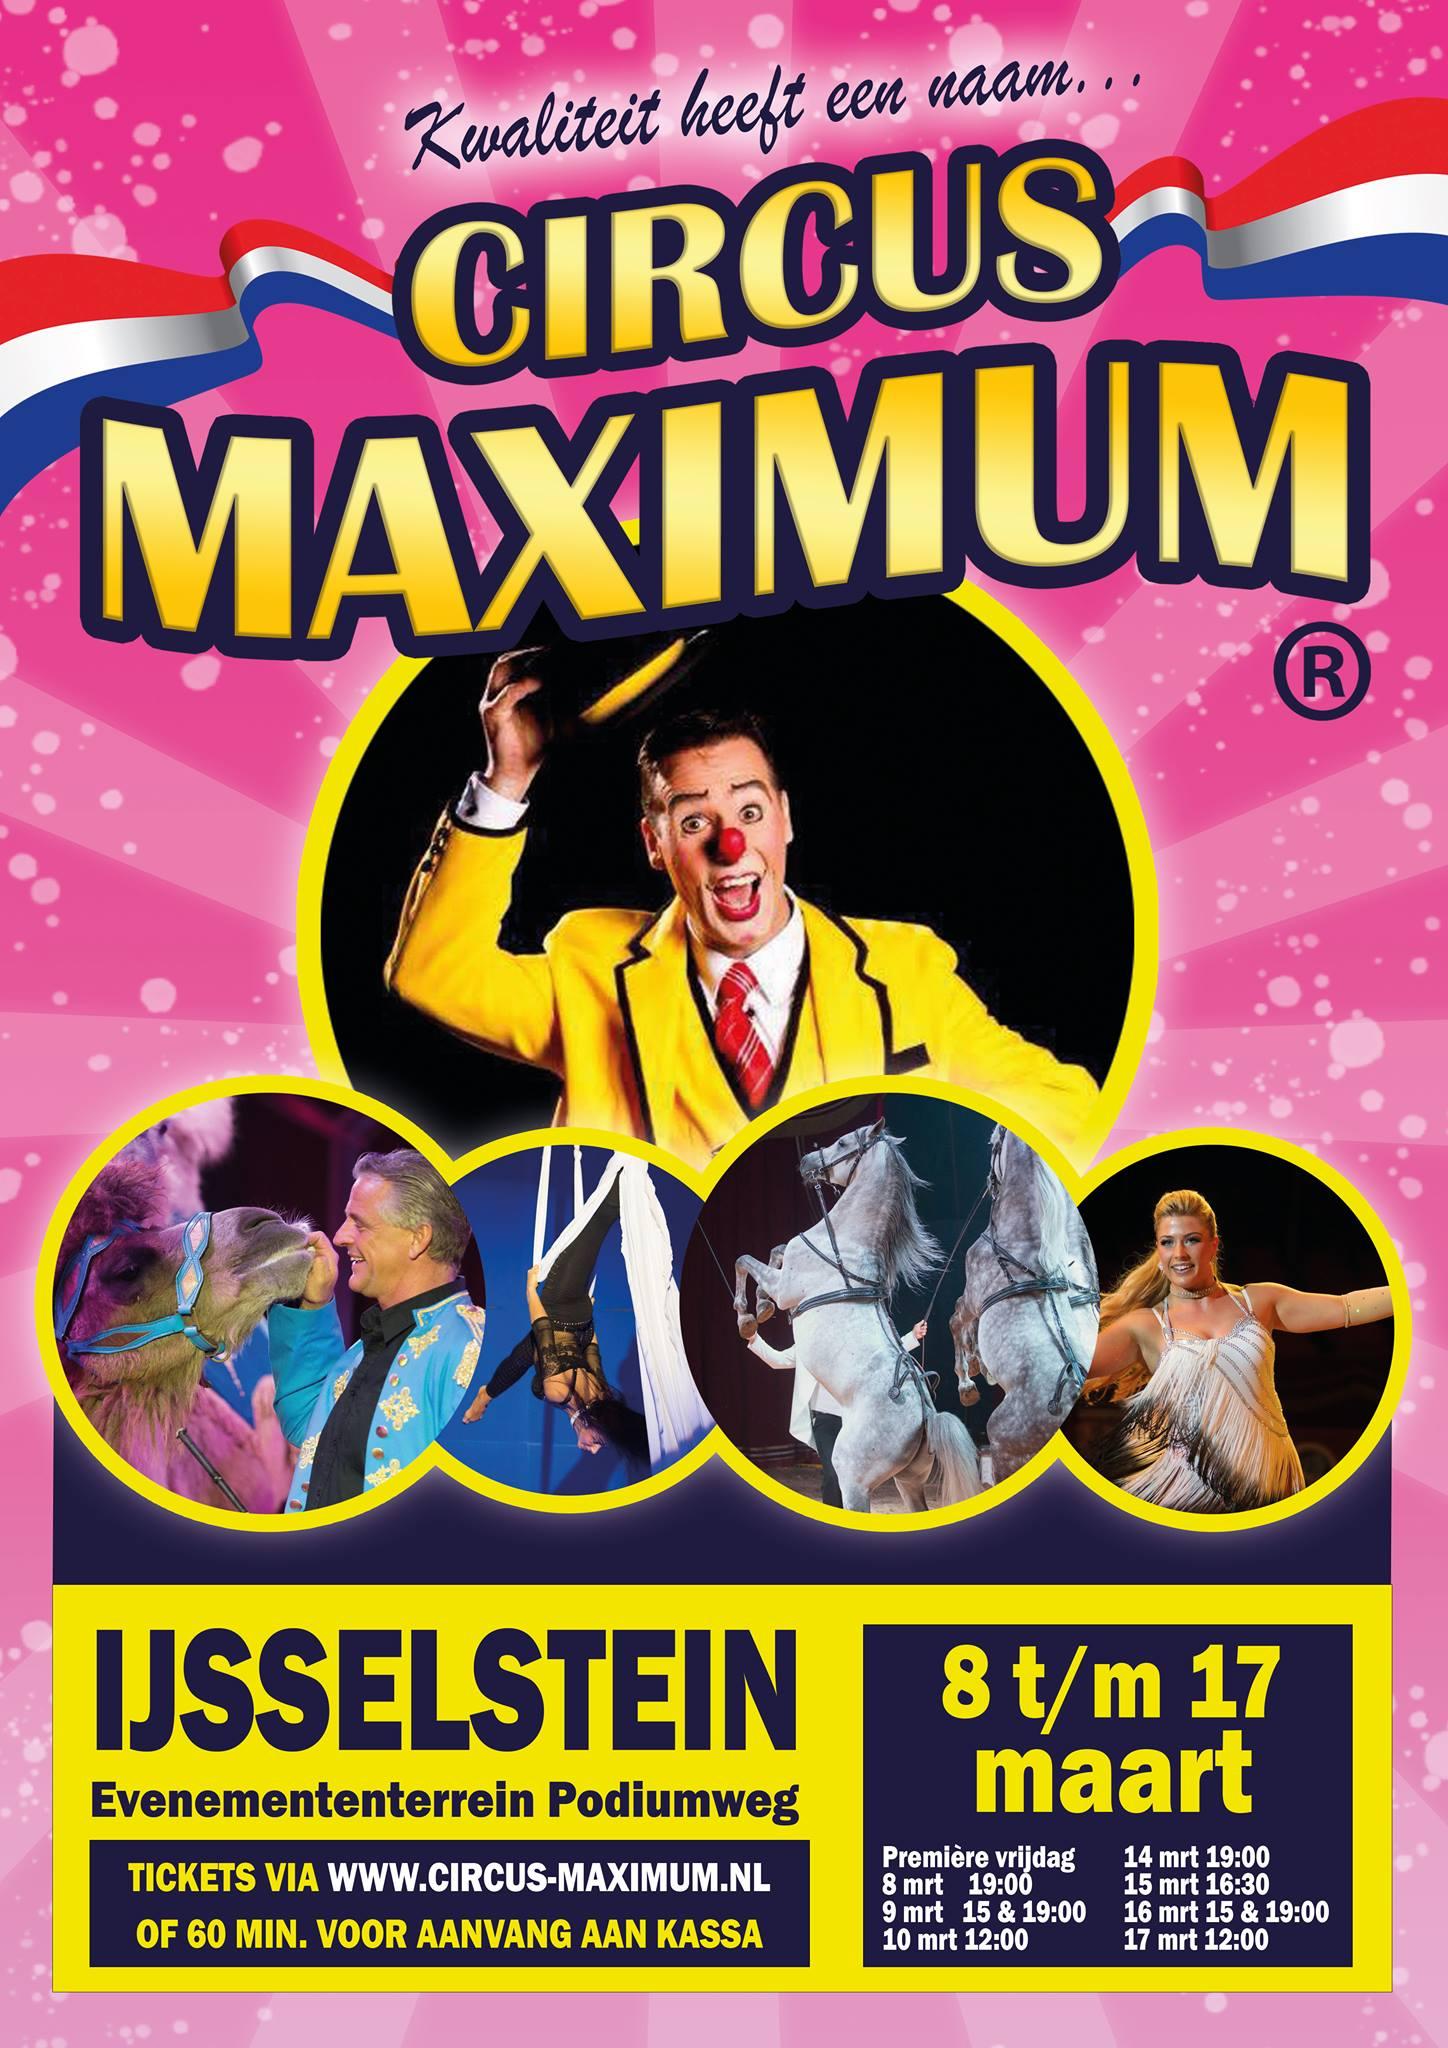 Circus Maximum in IJsselstein Utrecht - Lucas Fitness Gym